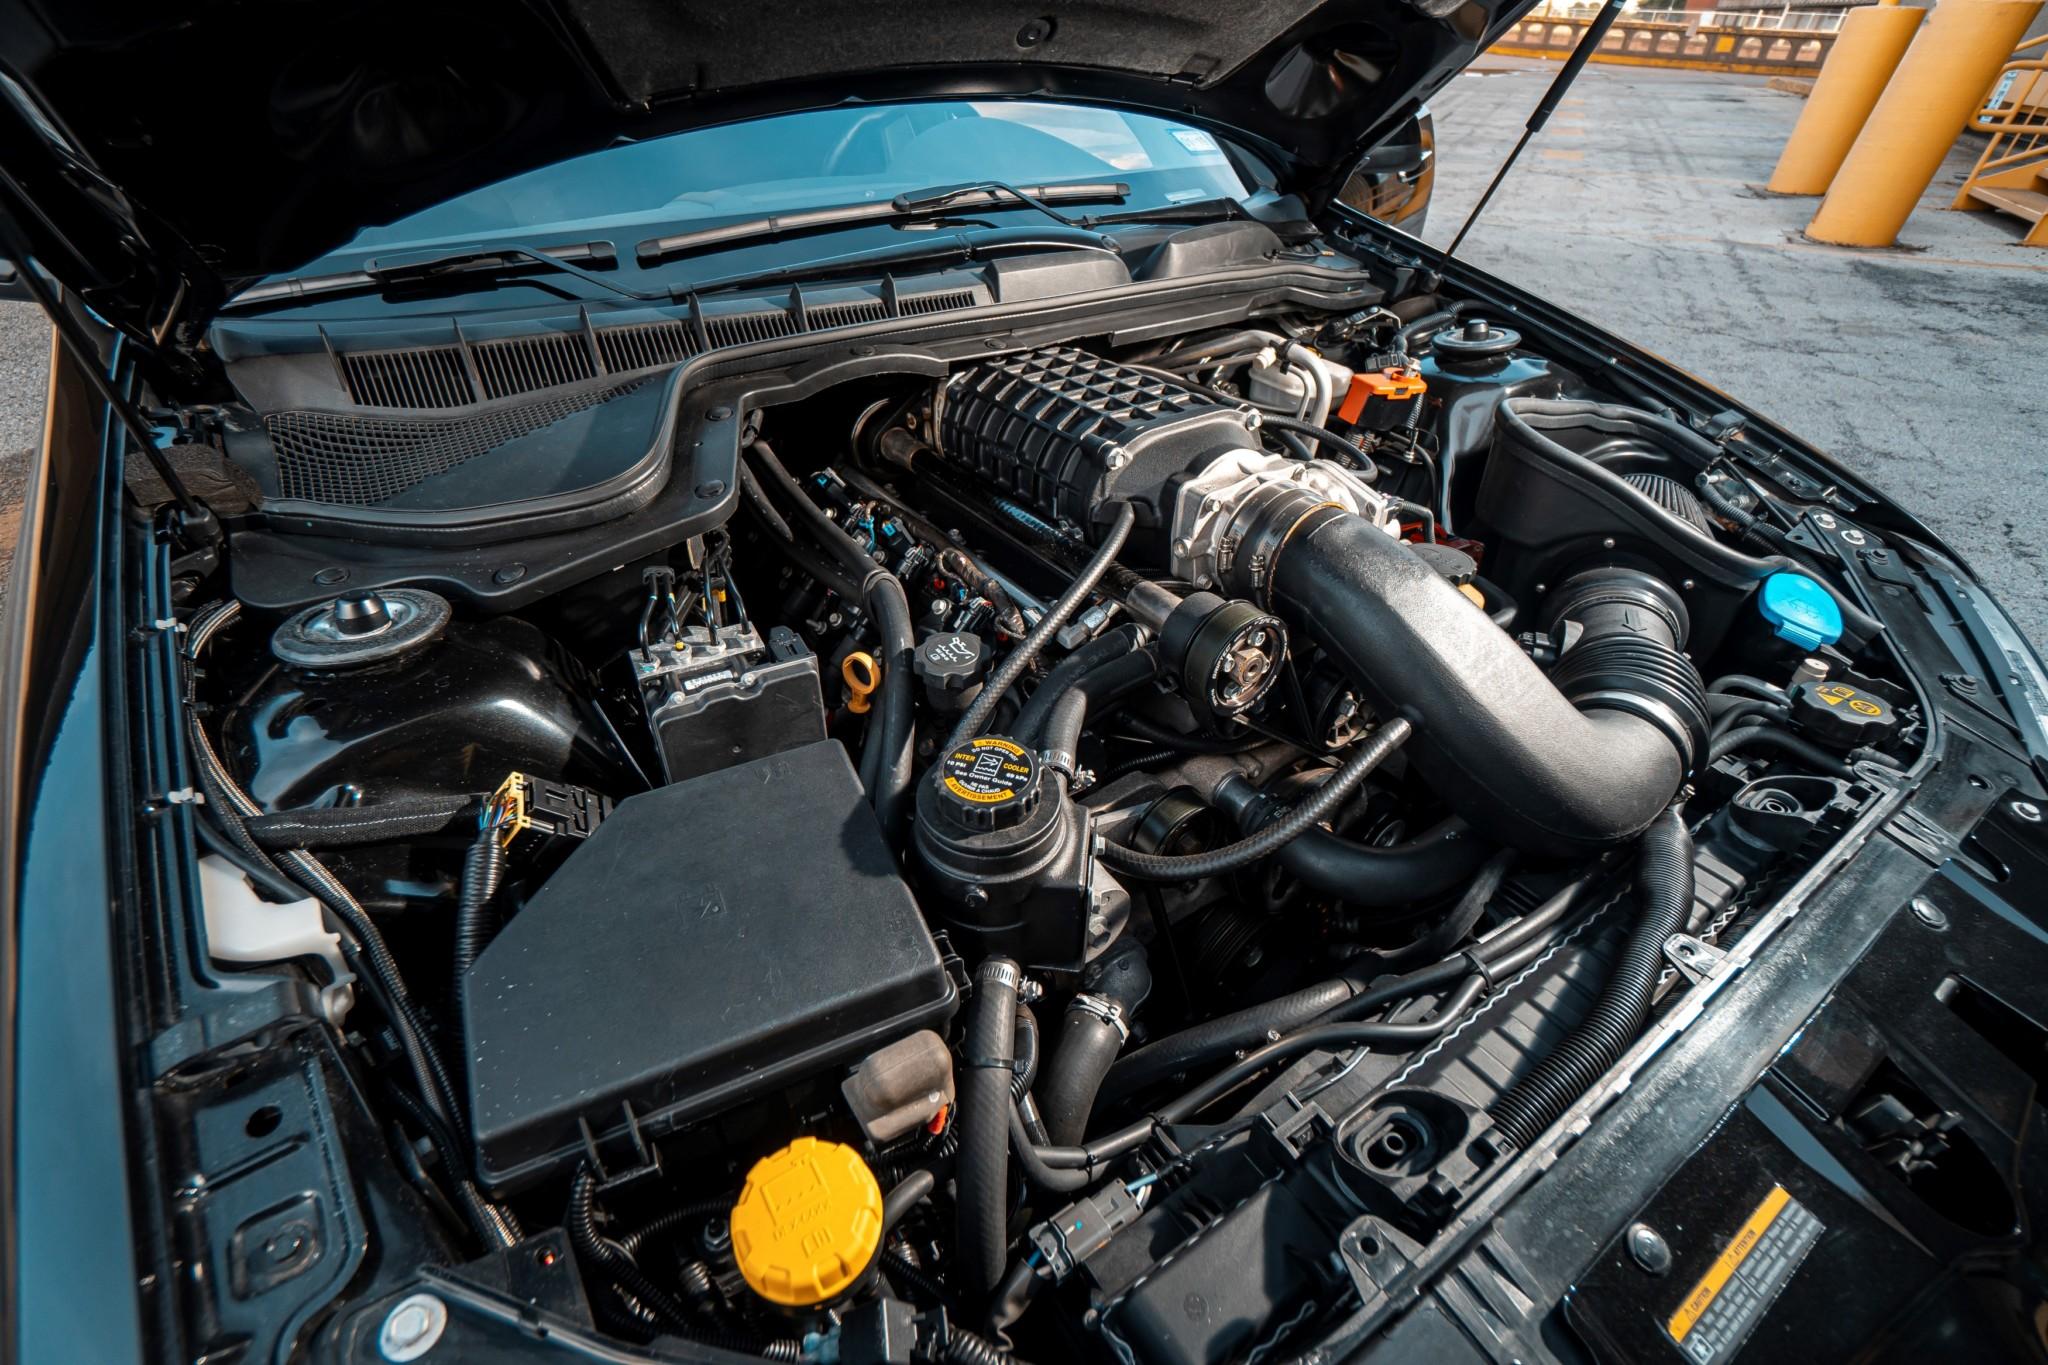 2008 Pontiac G8 SLP Firehawk Tribute engine